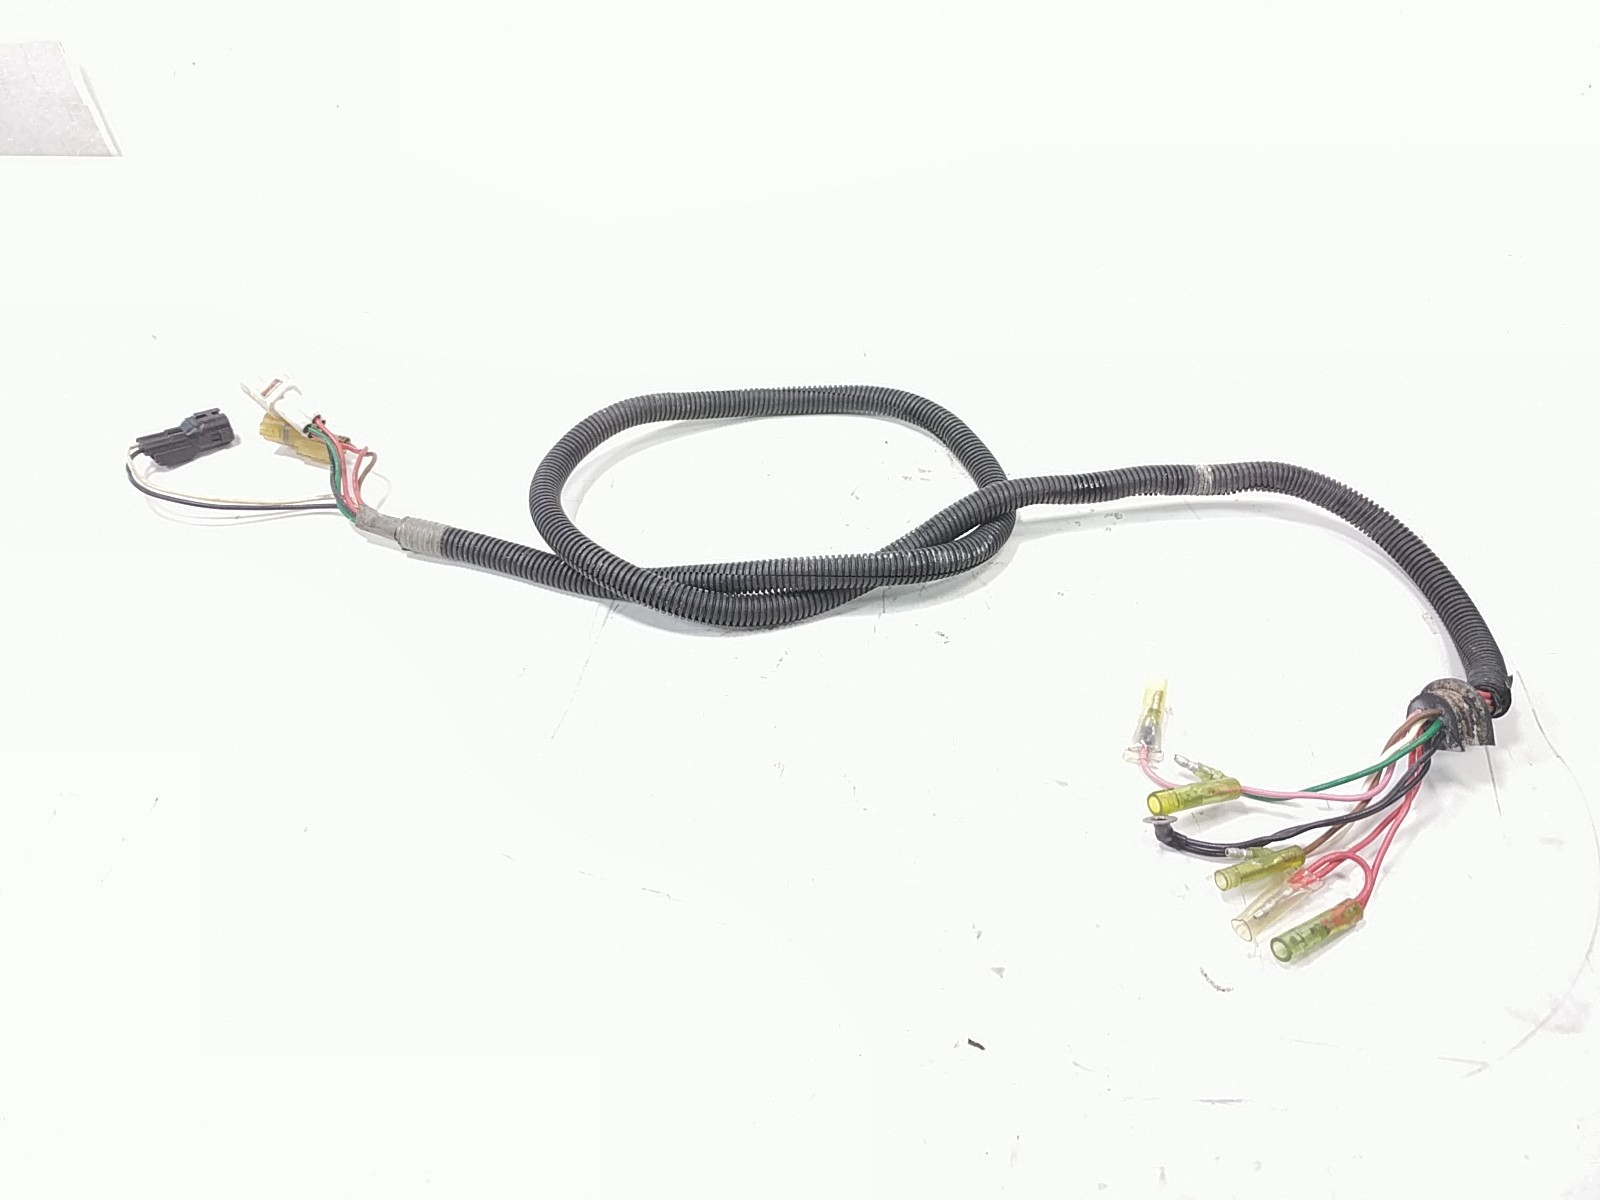 Yamaha Gp Wiring Wire Harness A